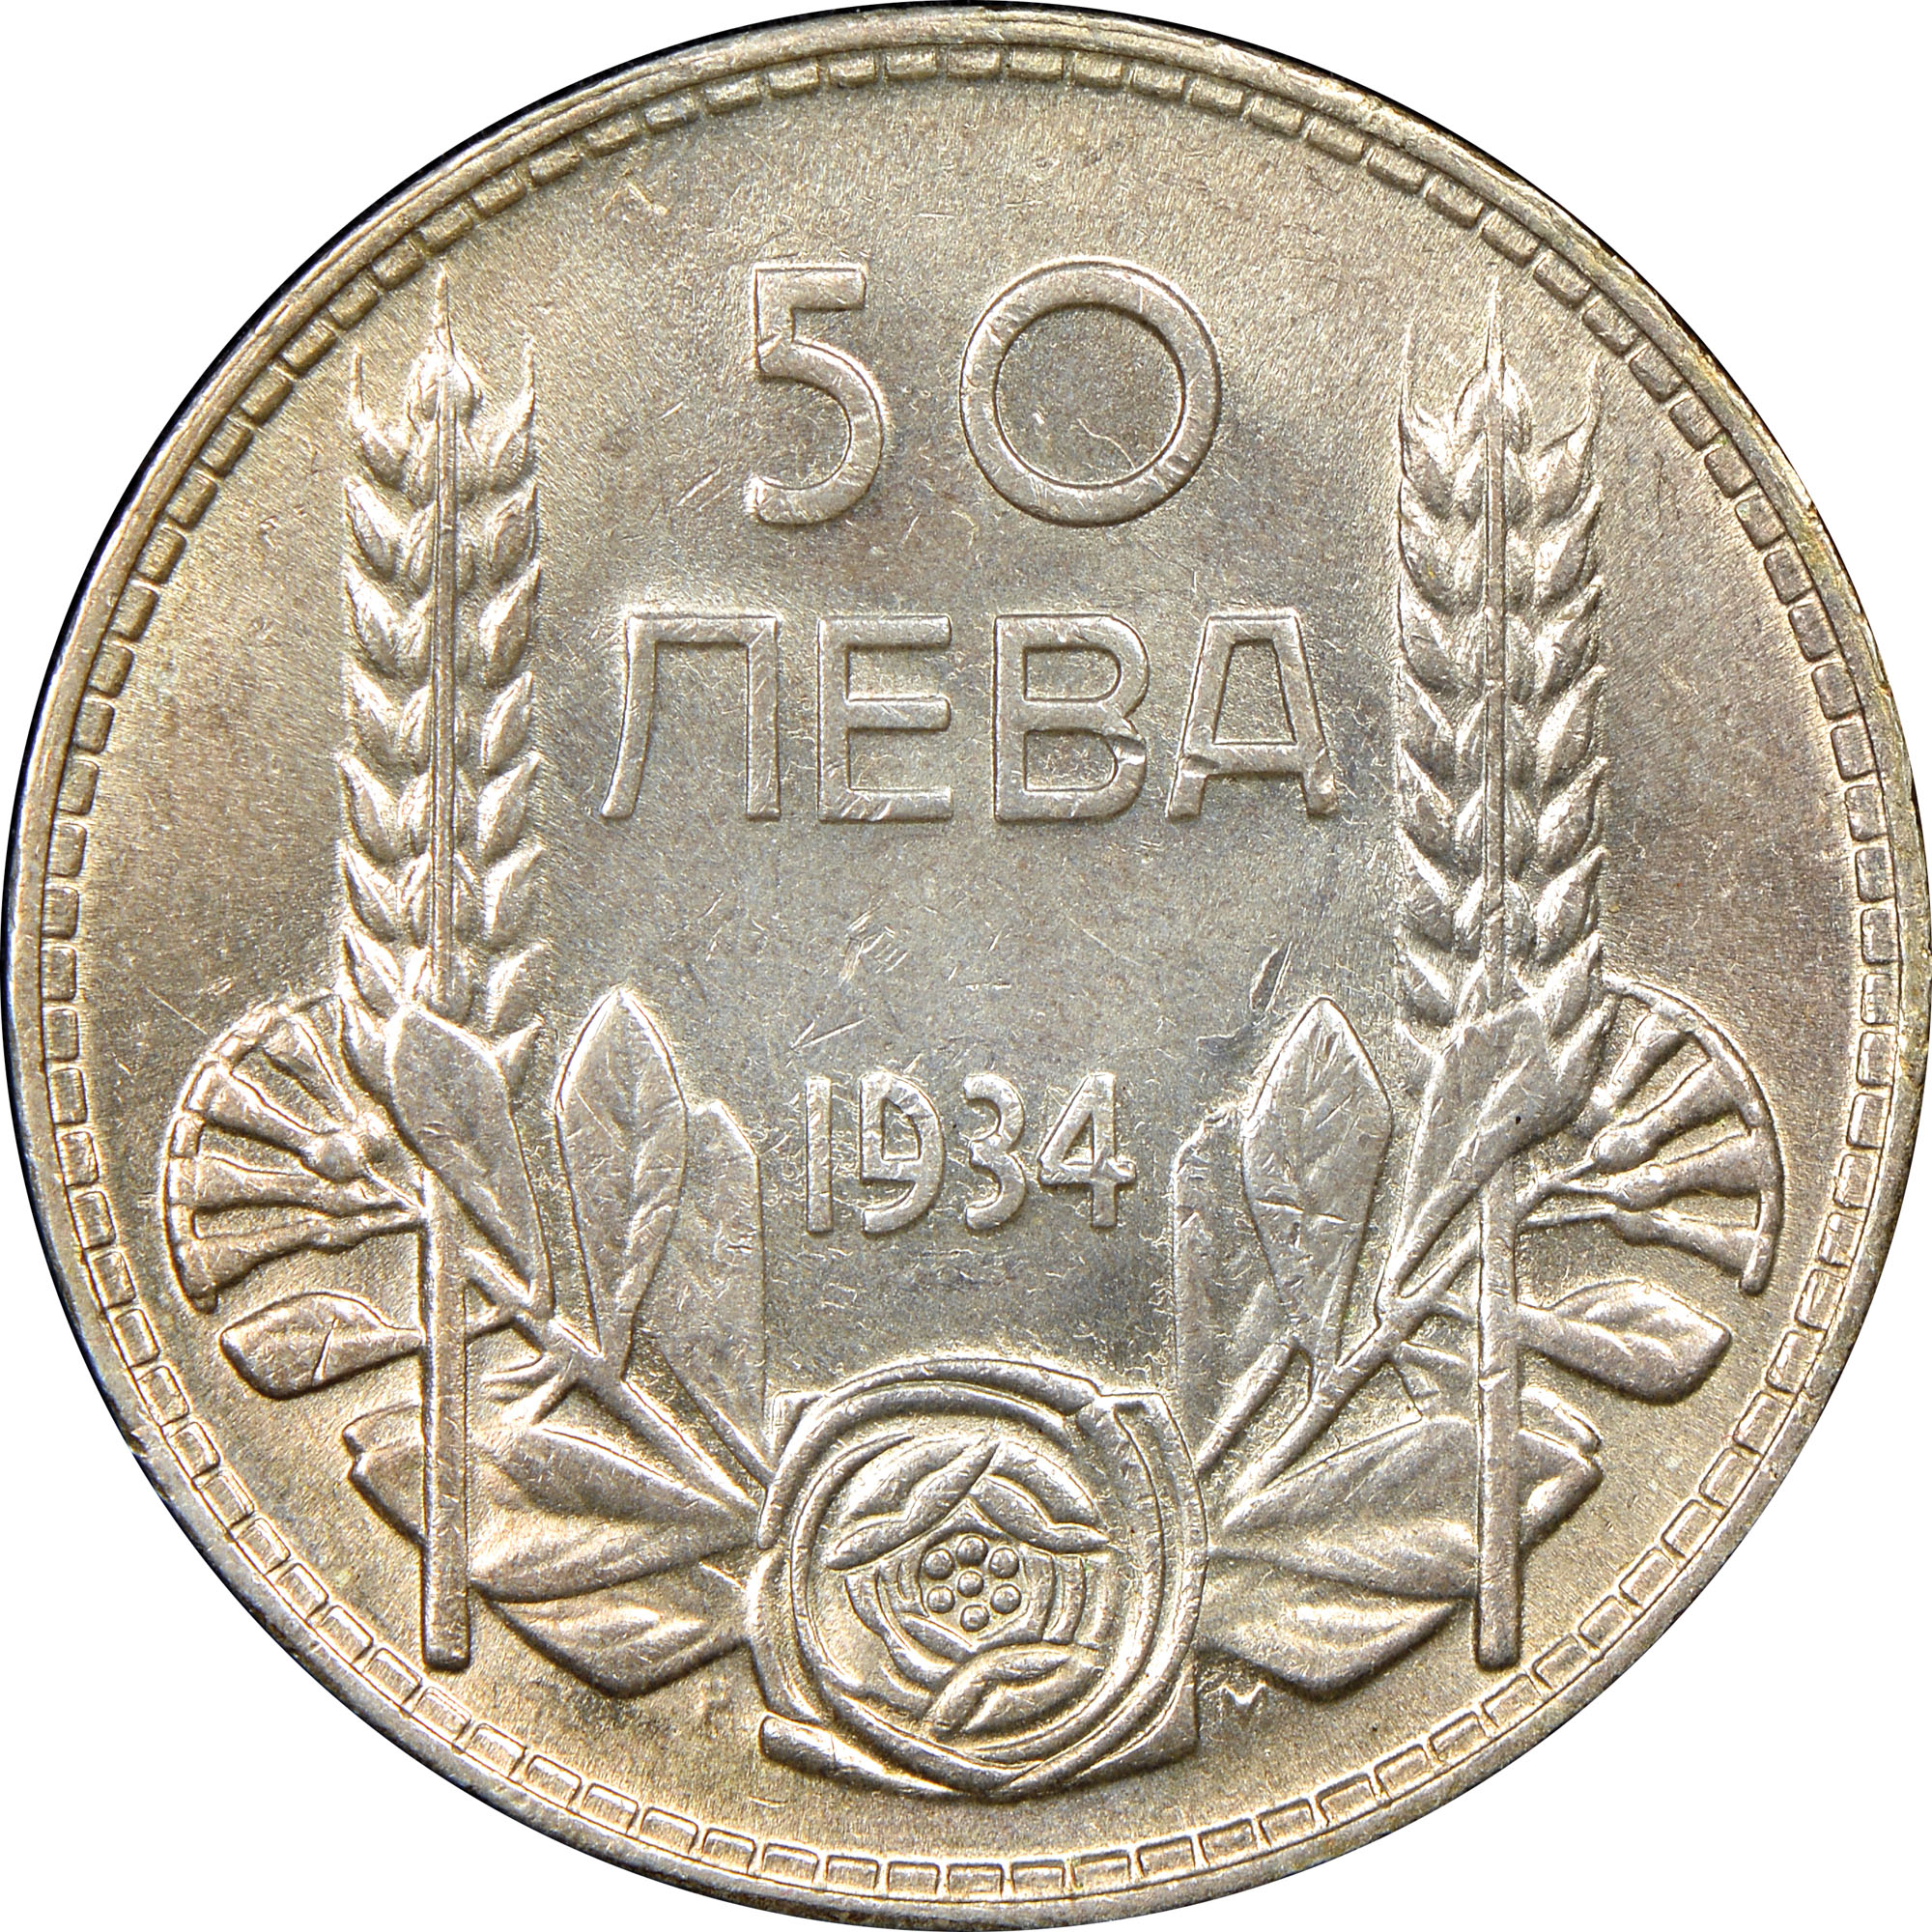 1934 Bulgaria 50 Leva reverse